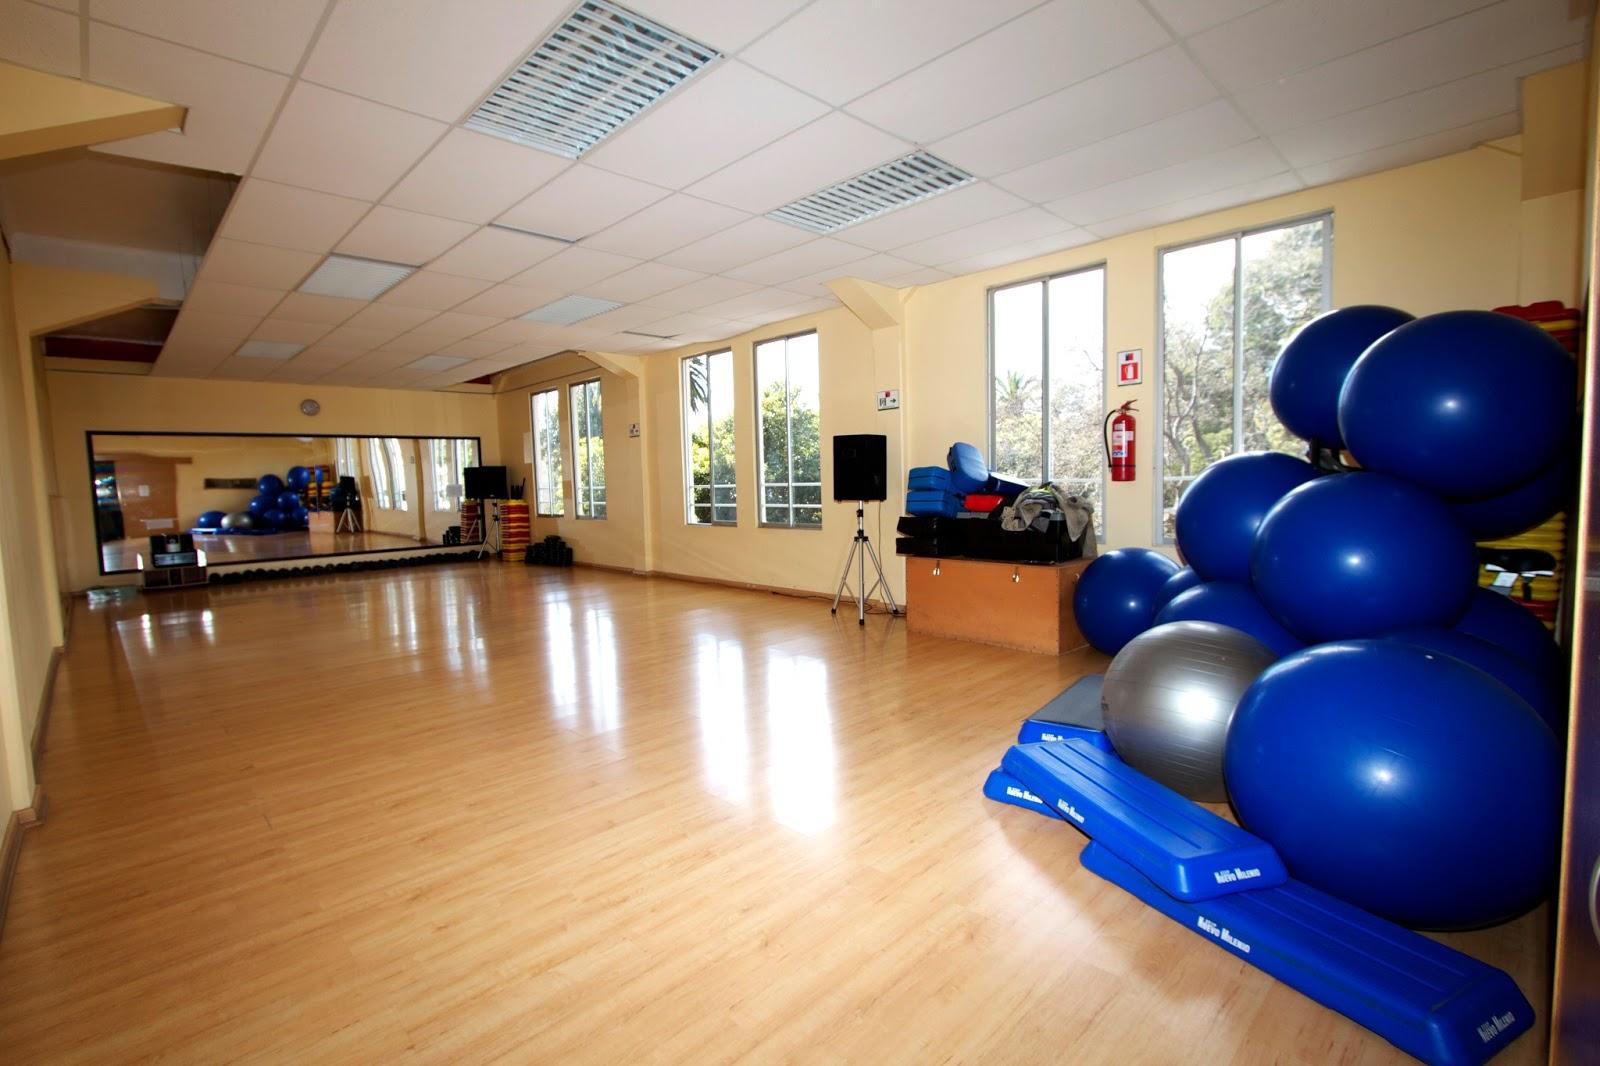 Gimnasio salud e imagen for Mejores gimnasios